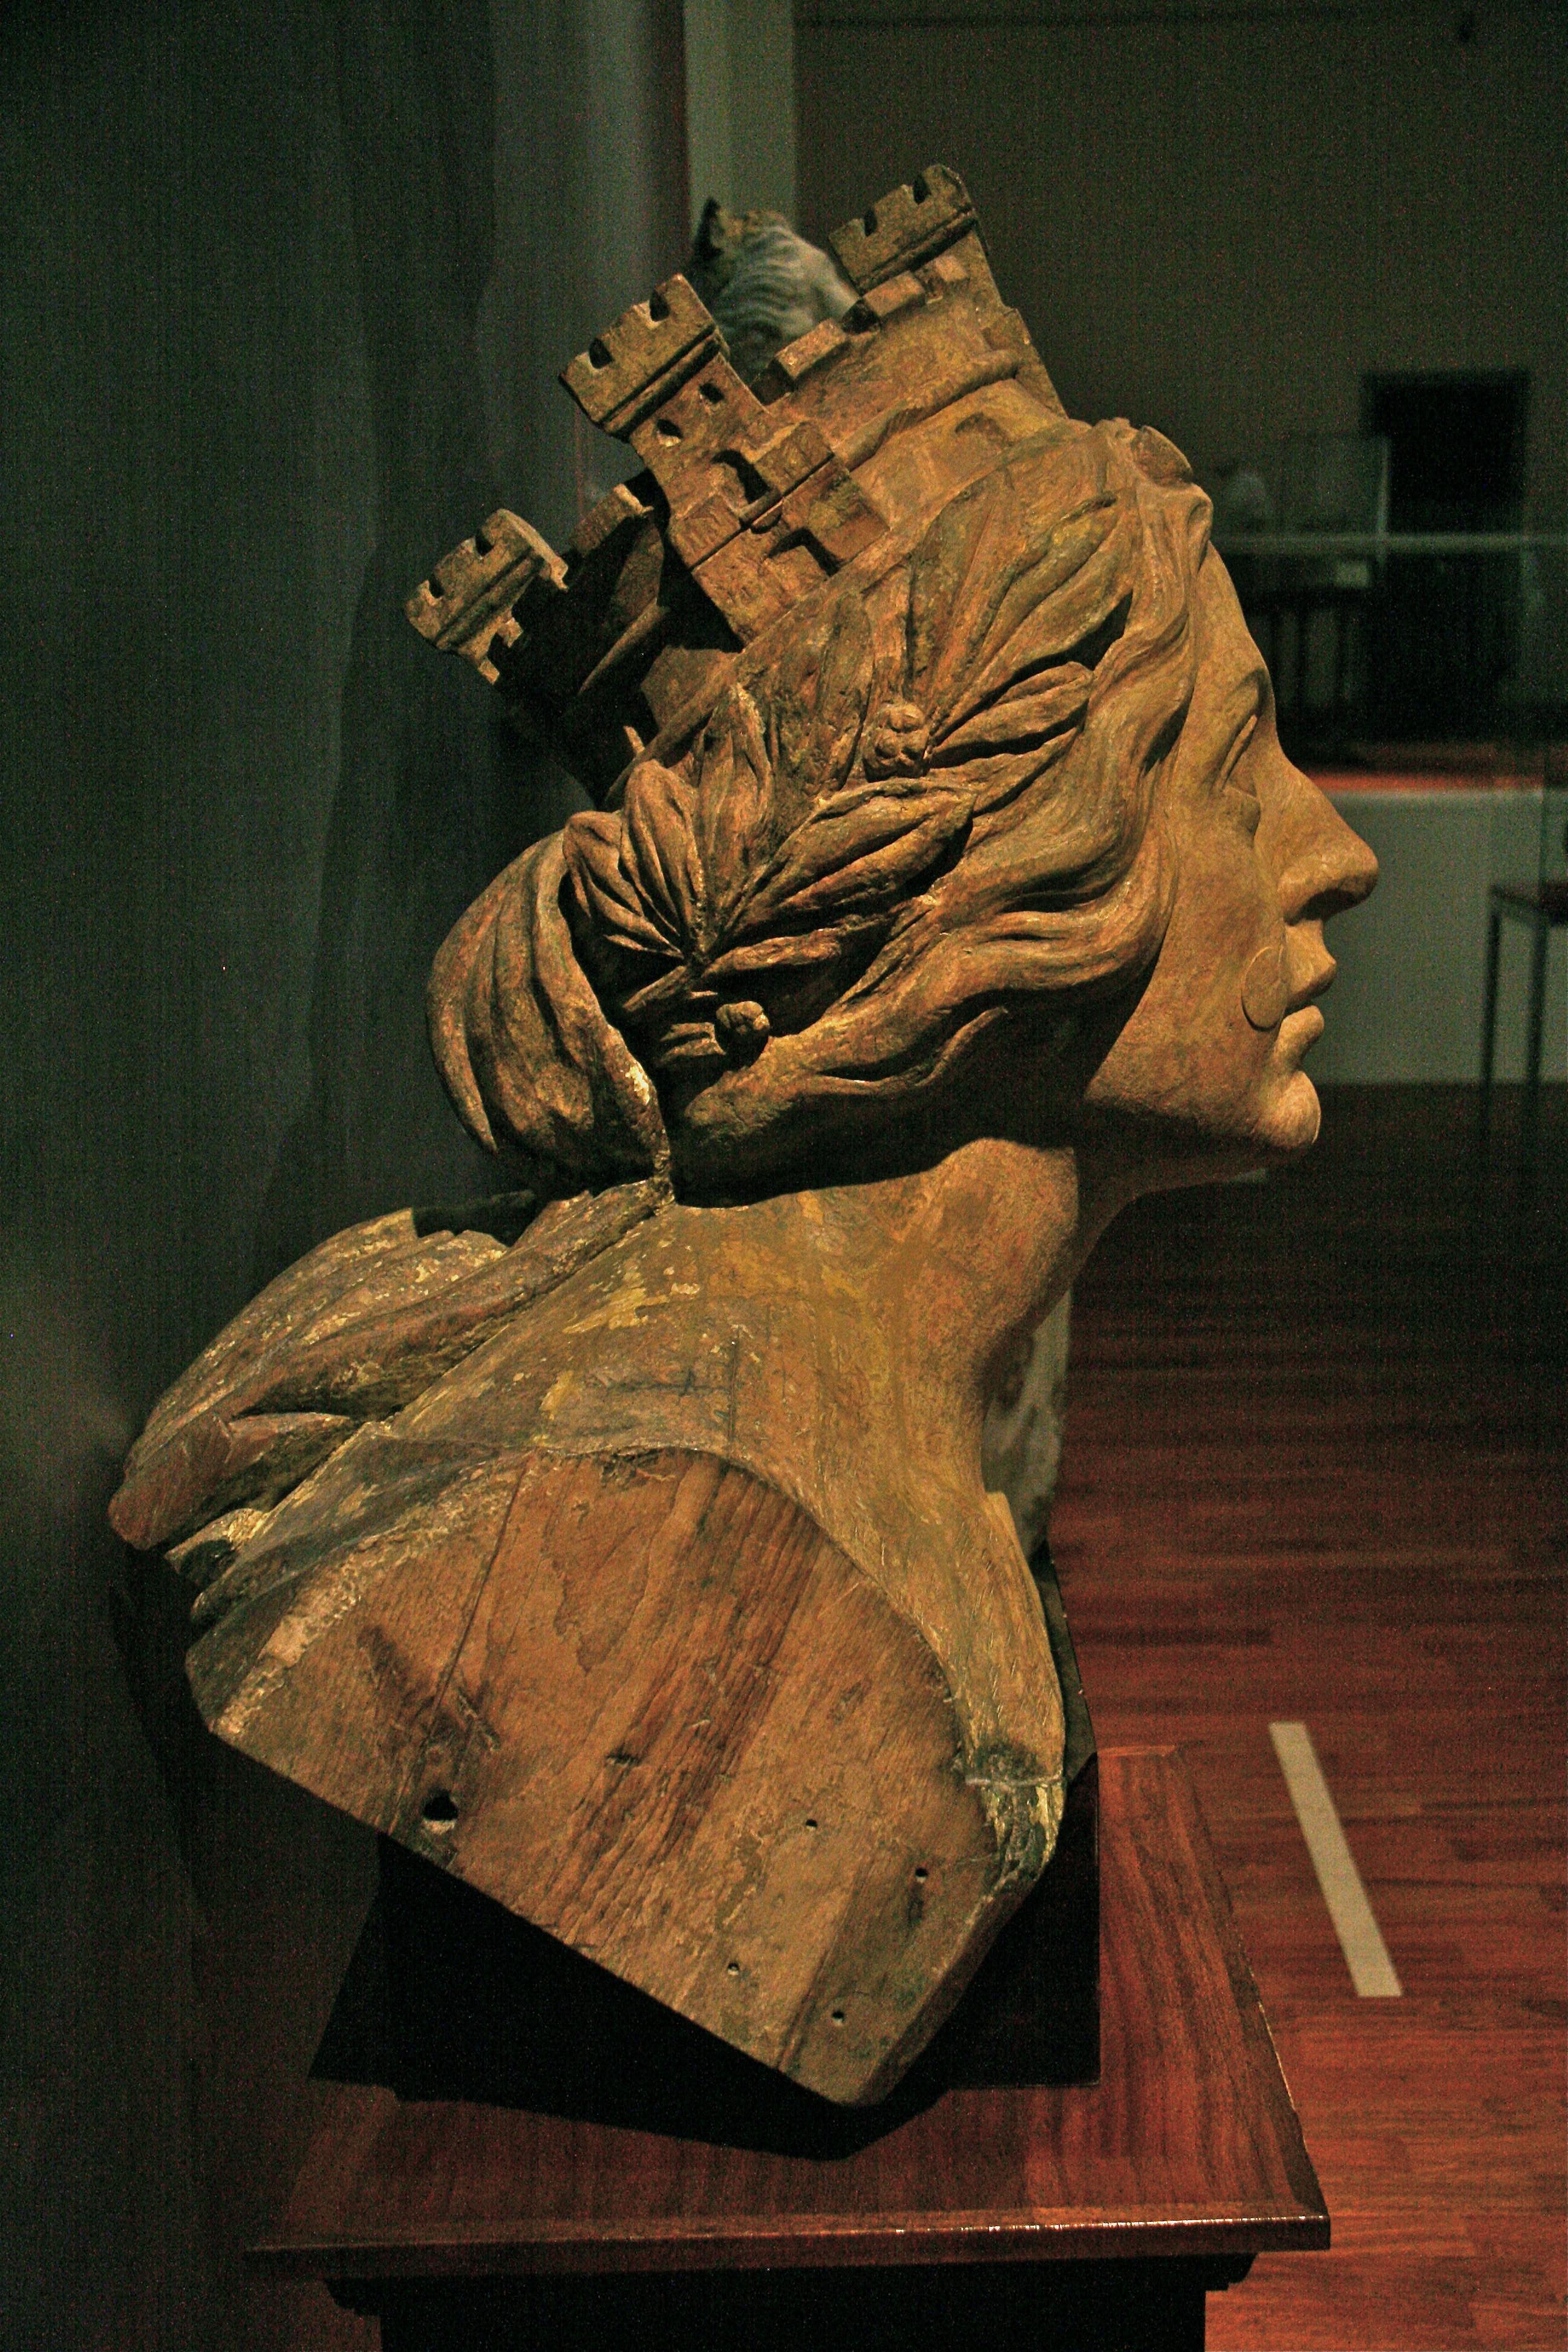 http://upload.wikimedia.org/wikipedia/commons/1/14/Mascar%C3%B3n_de_Juan_Sebast%C3%A1n_el_Cano.jpg